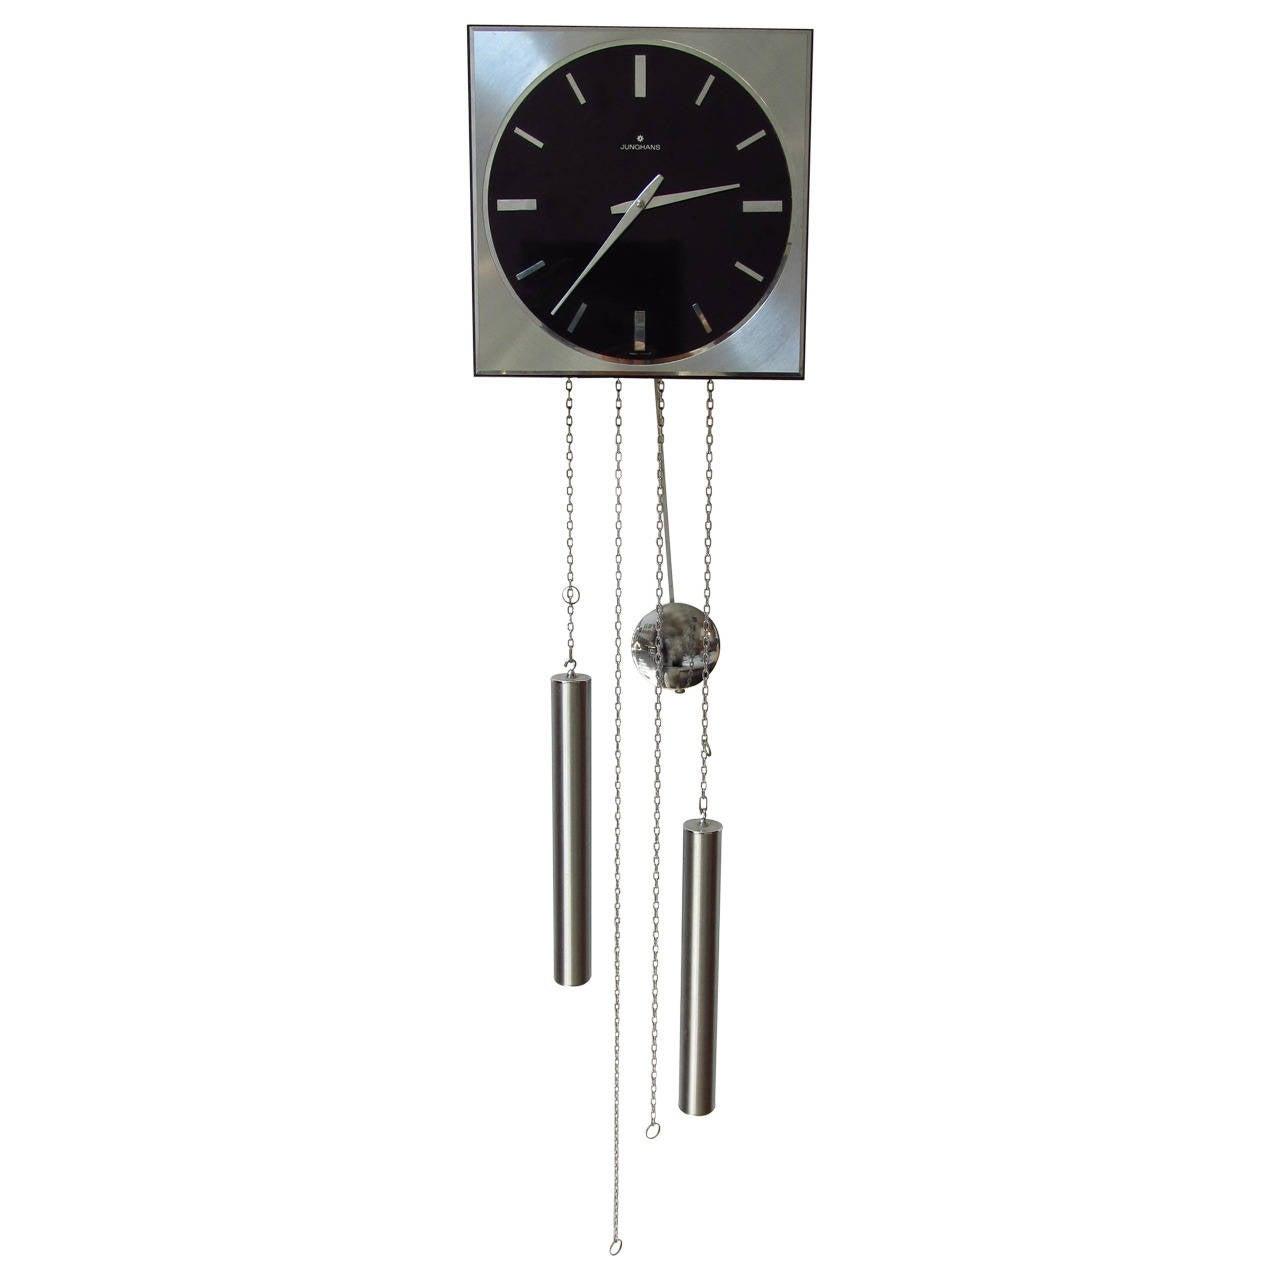 Junghans german made mid century modern pendulum clock at 1stdibs - Contemporary pendulum wall clock ...